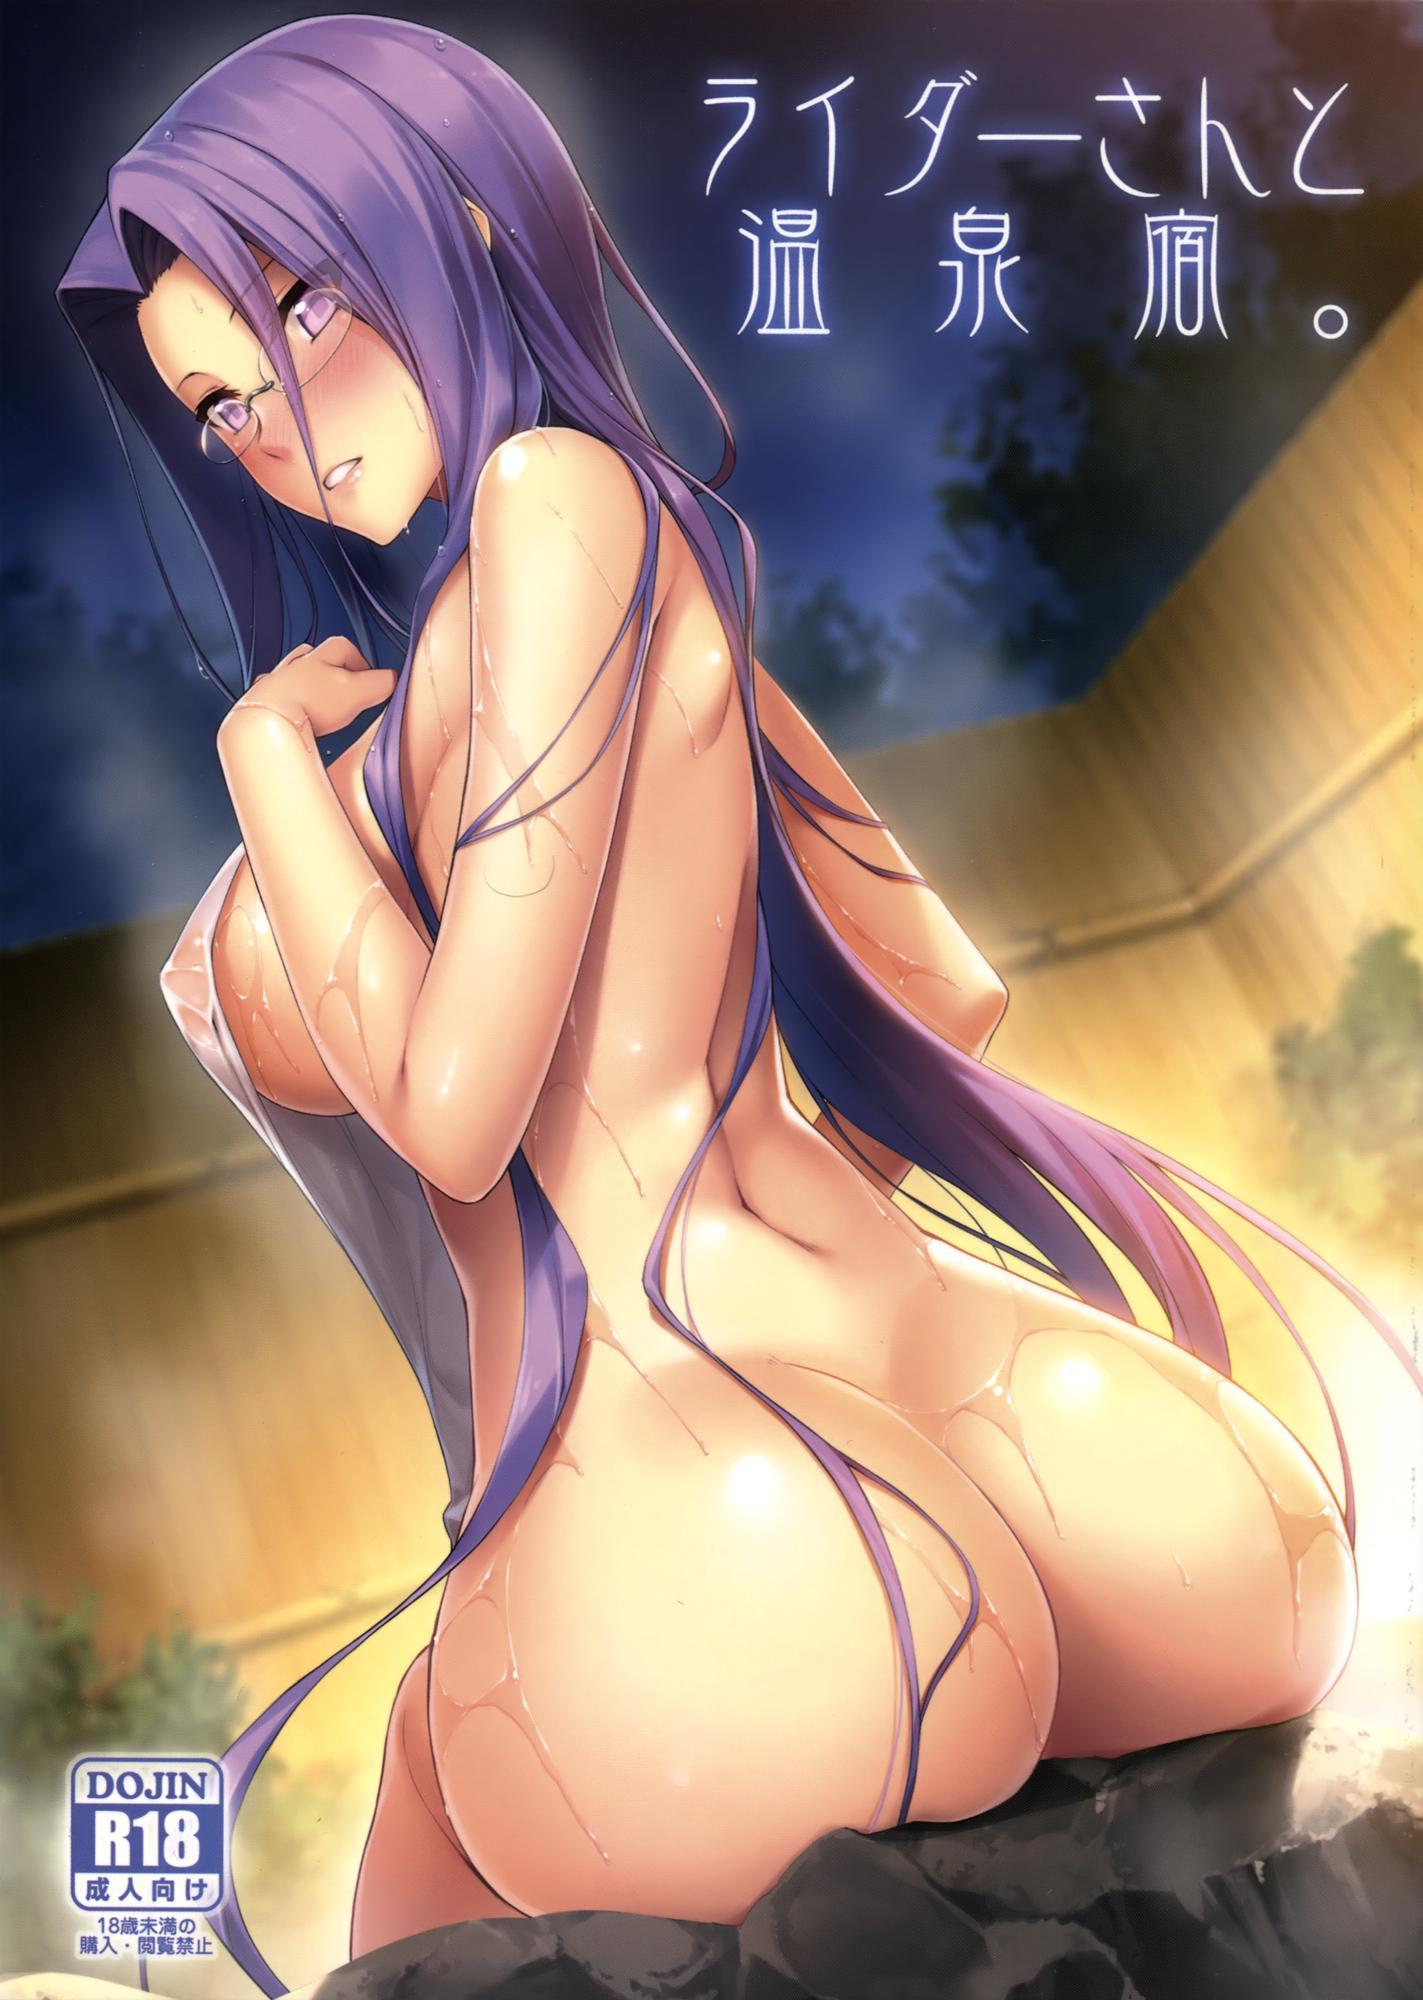 (C87) [S.S.L (Yanagi)] Rider-san to Onsen Yado. | Hot Spring Inn With Rider-san. (Fate/stay night) [English] [Facedesk] 0